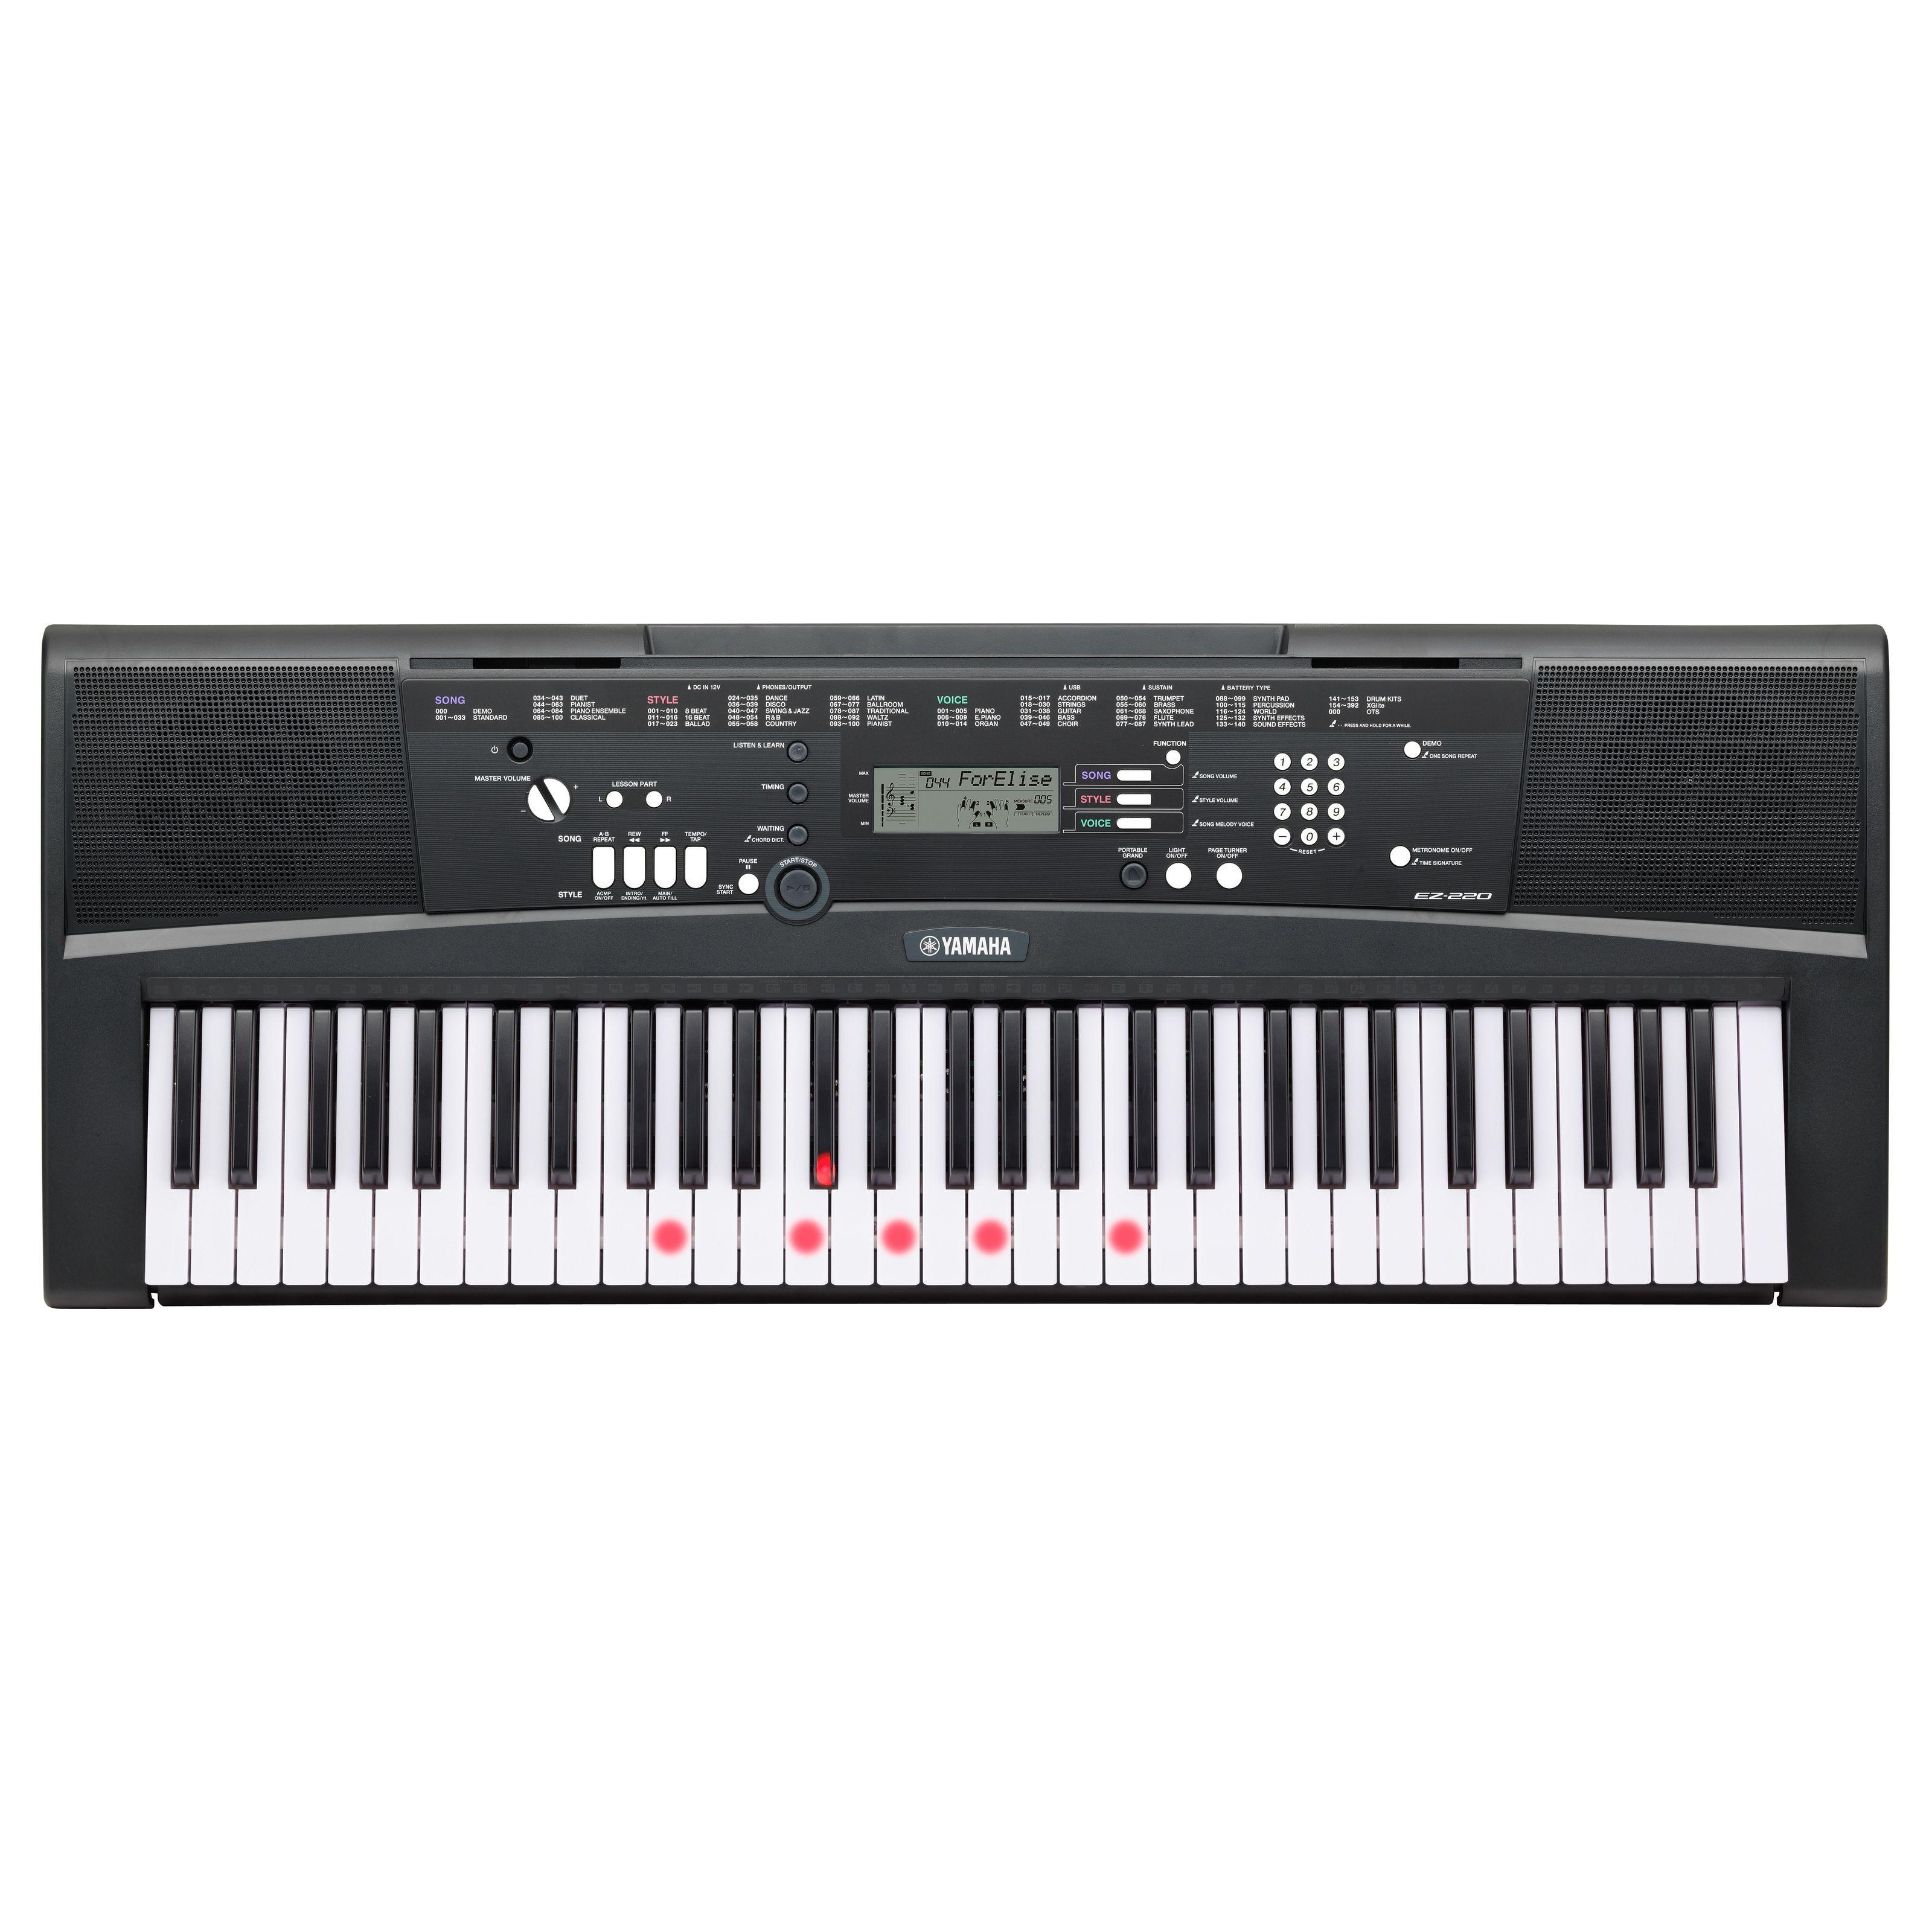 yamaha ez-220 teclas iluminadas de teclado